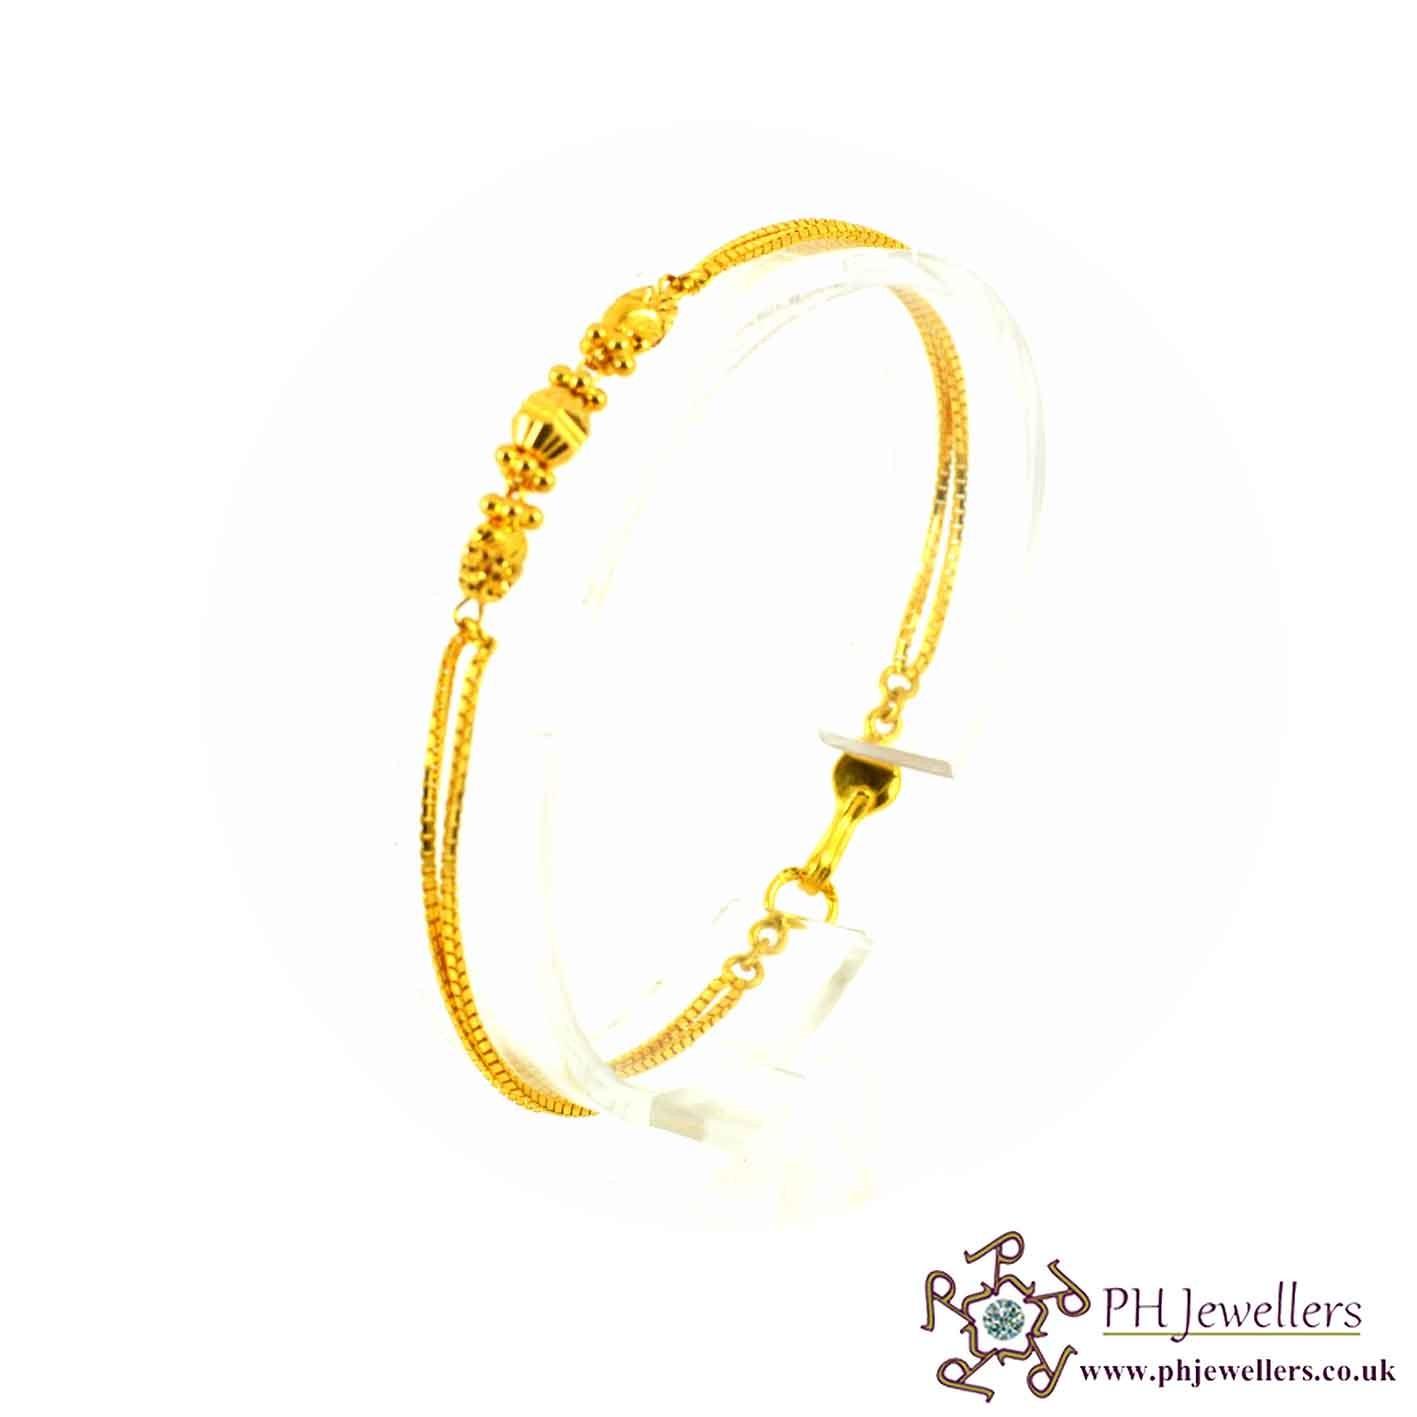 22ct 916 Hallmark Yellow Gold Bracelet LB9